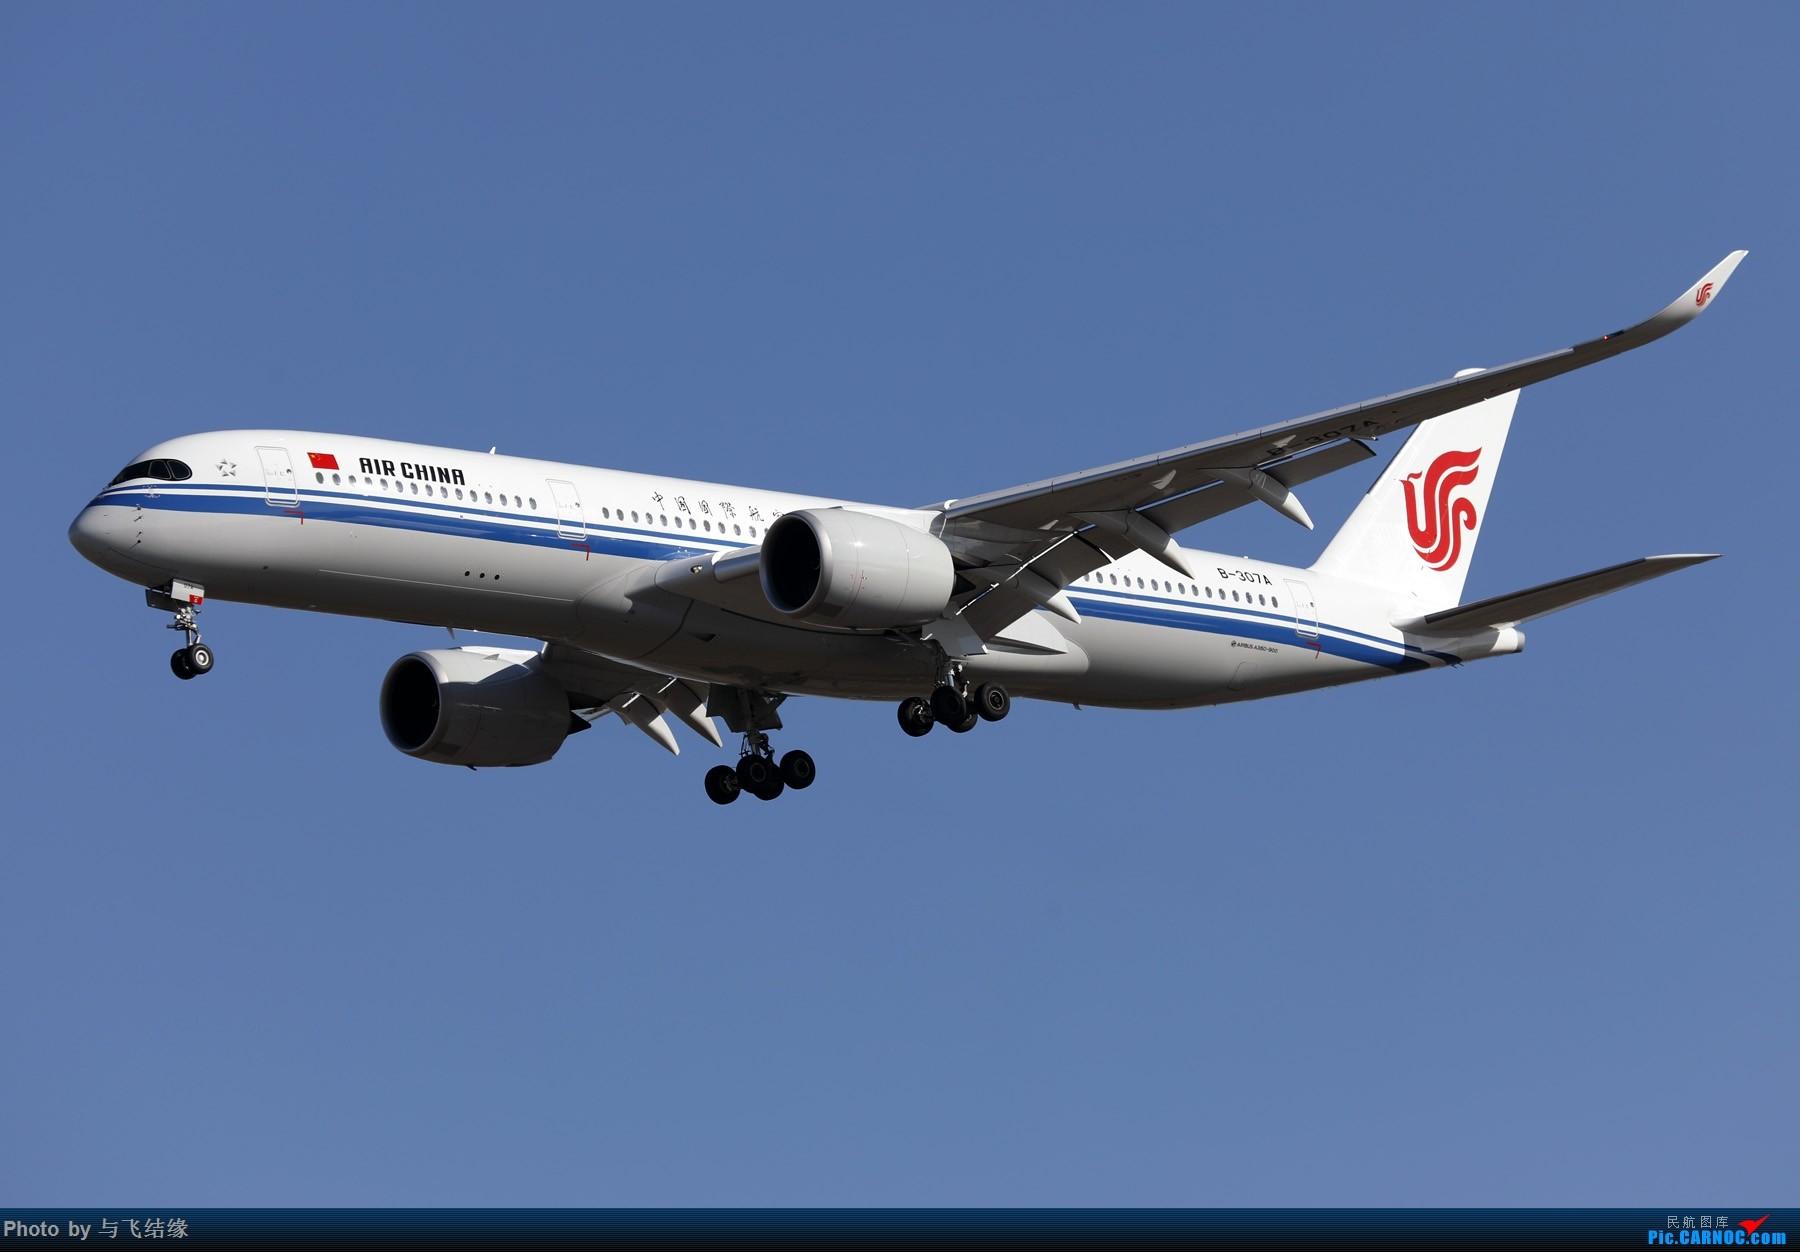 Re:[原创]以色列航空波音777-200、加拿大航空波音77W新装、国航最新空客350-900. AIRBUS A350-900 B-307A 中国北京首都国际机场